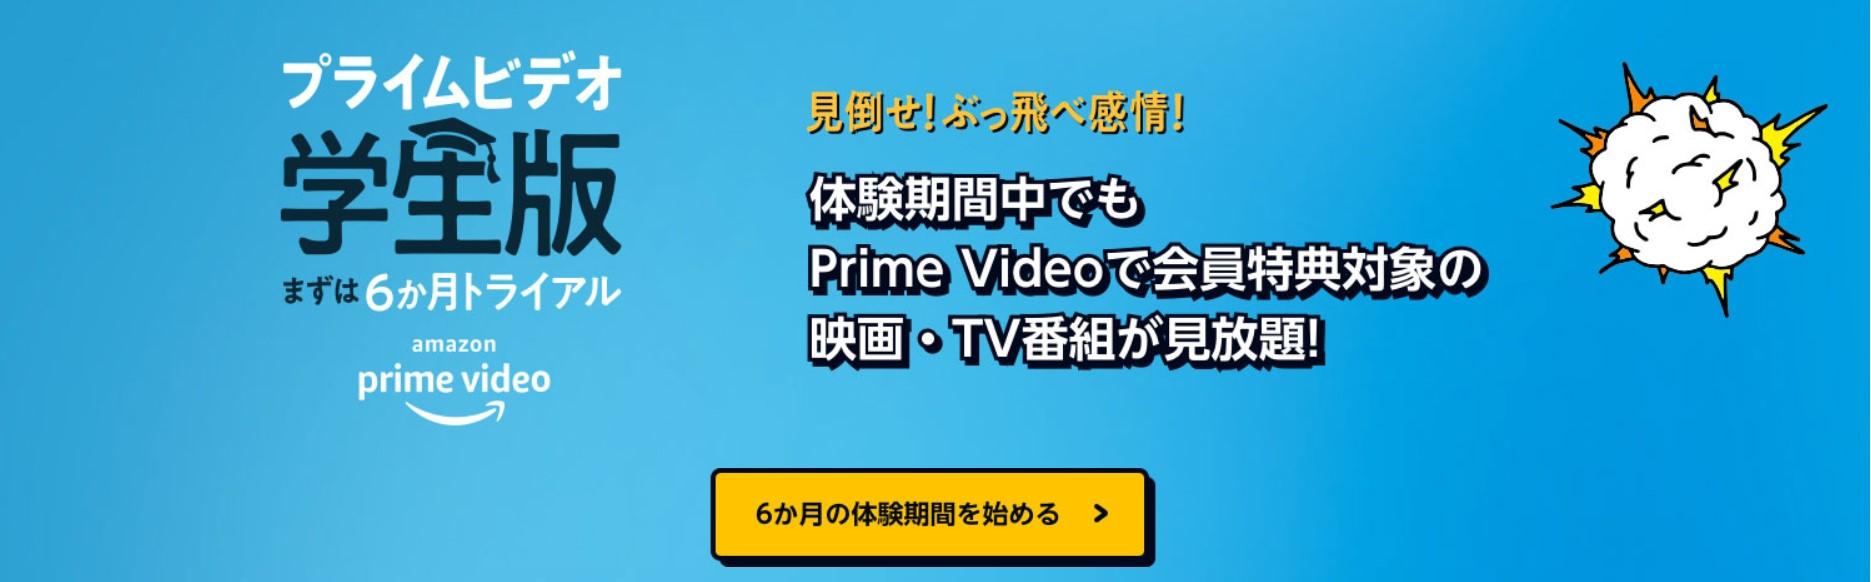 Amazon Prime Student6ヶ月間無料体験申込方法